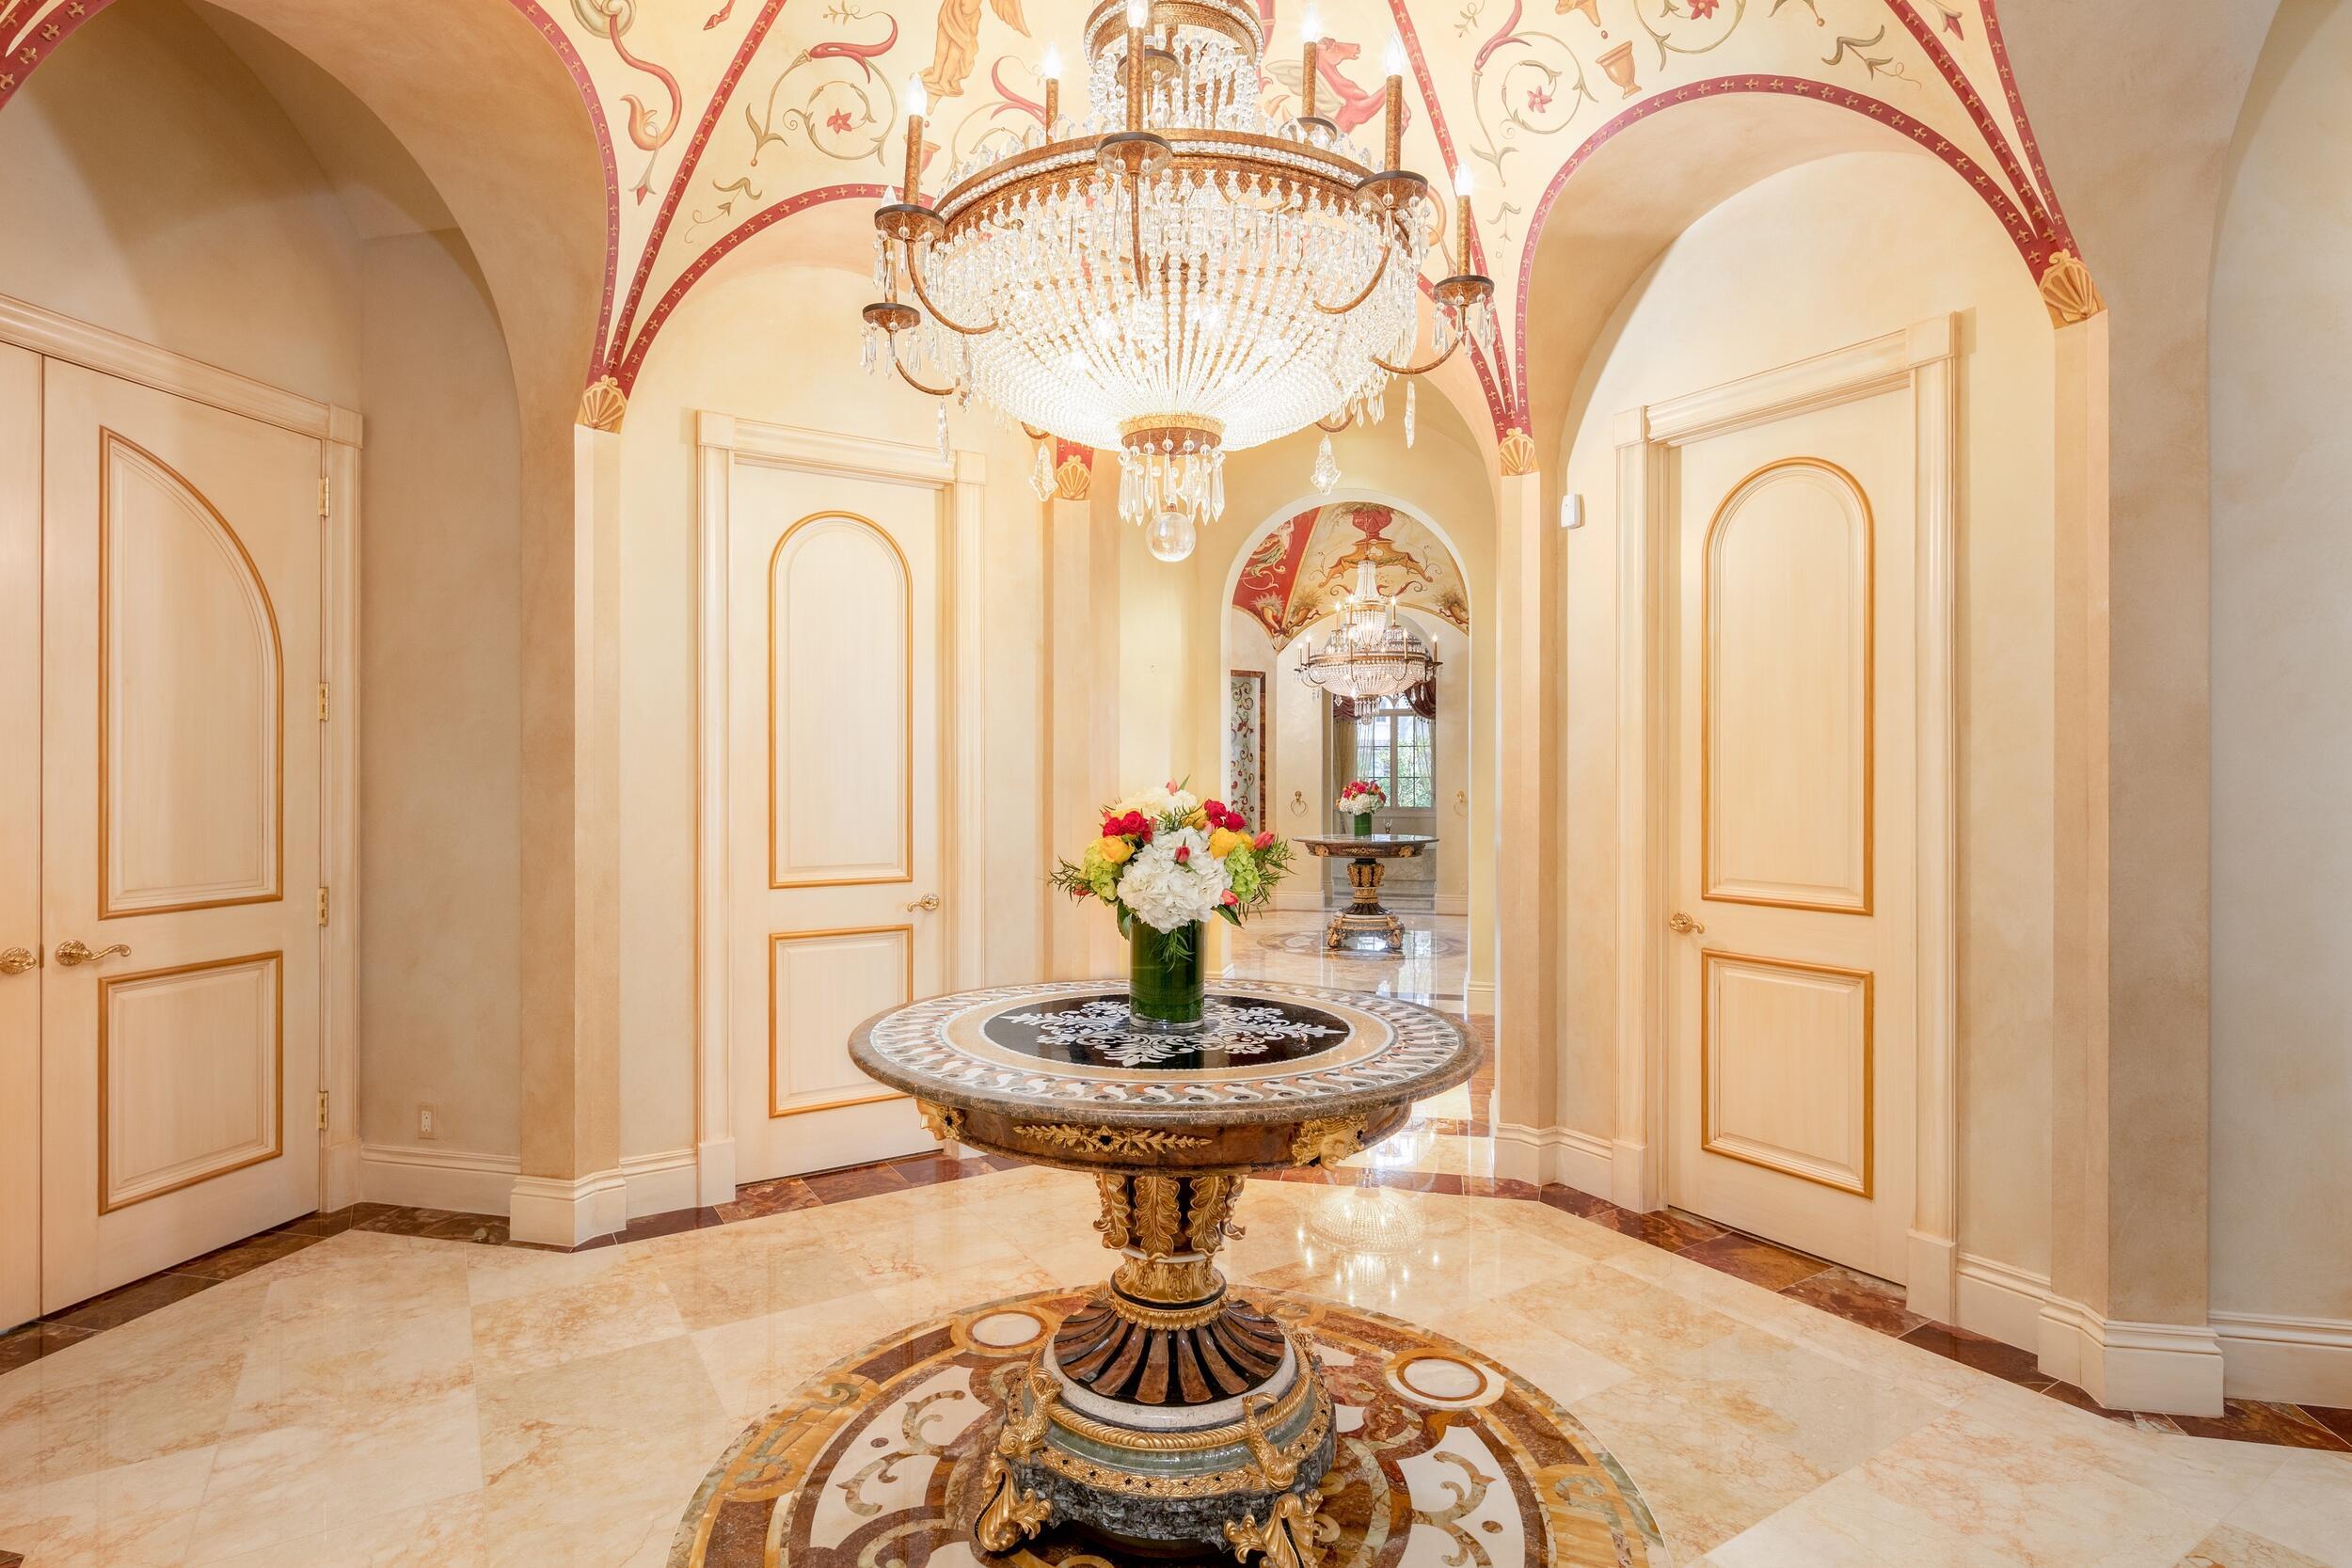 Owner's Hallway